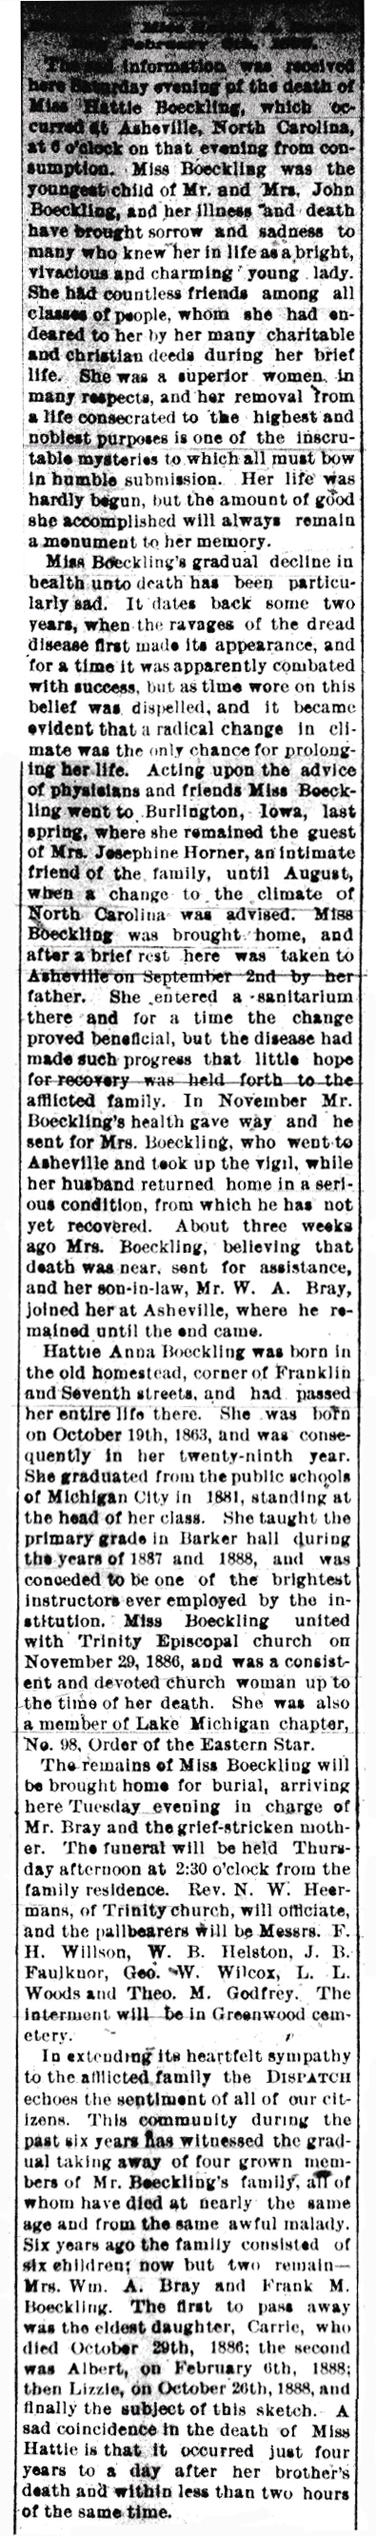 Hattie Boeckling obituary